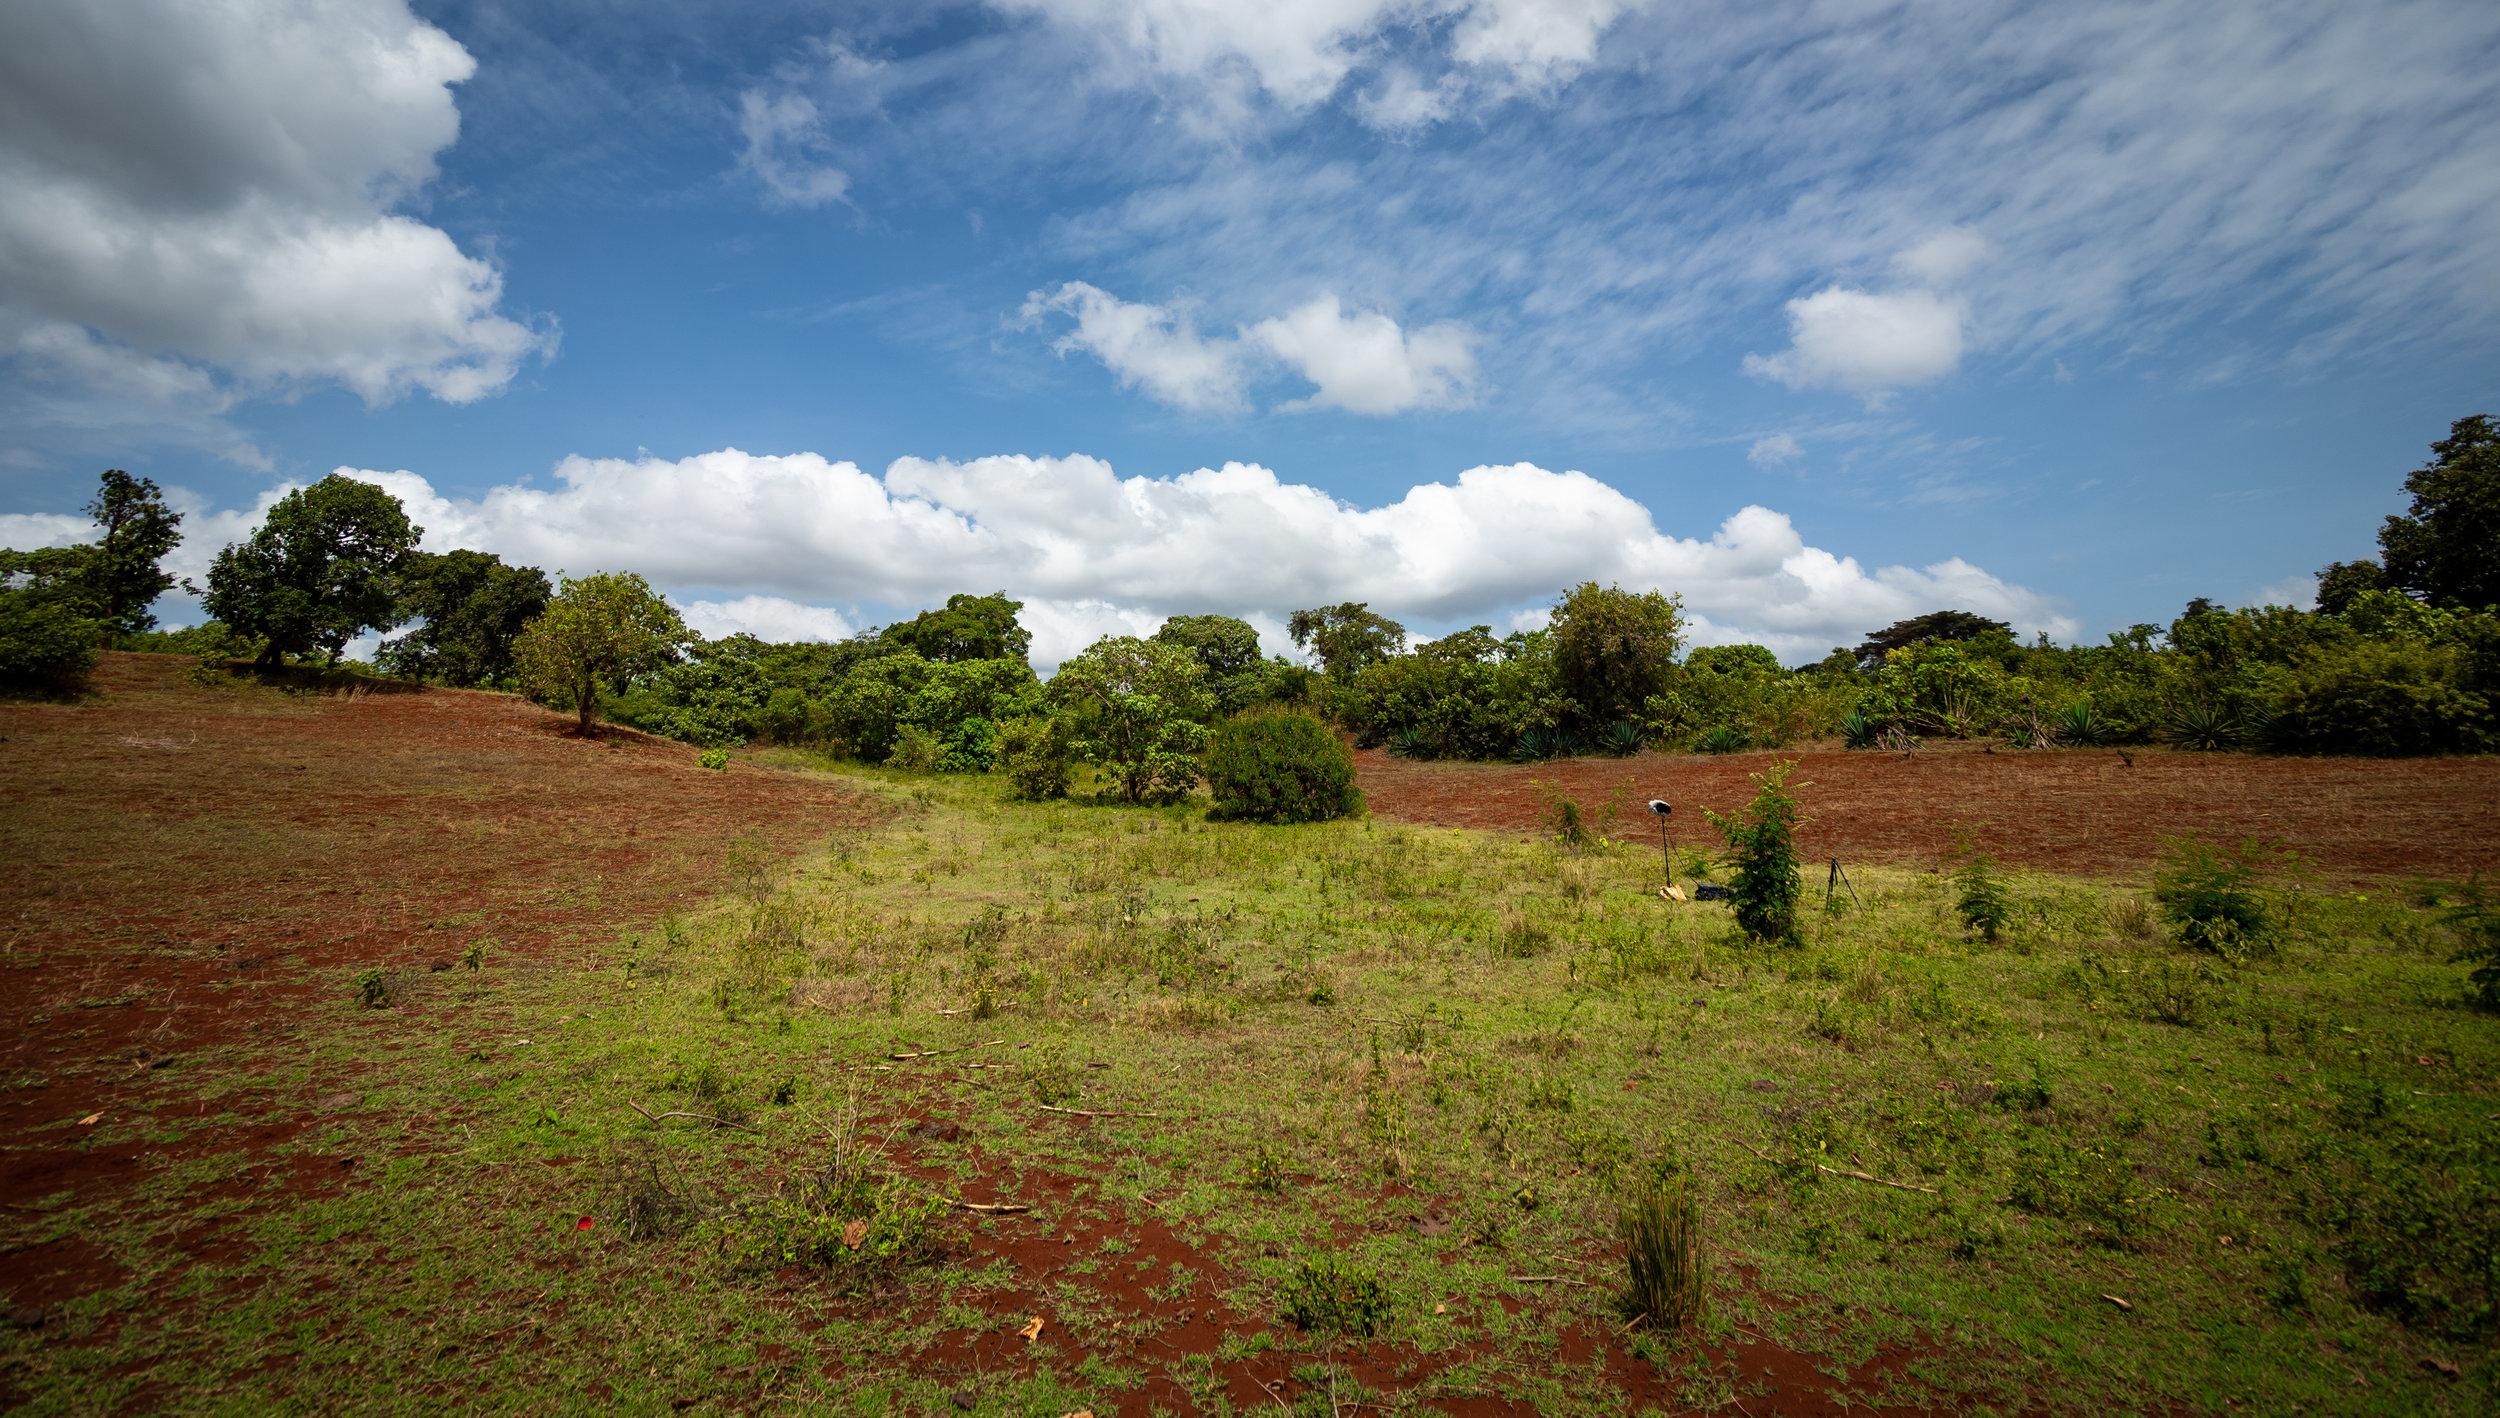 Field recording distant village life